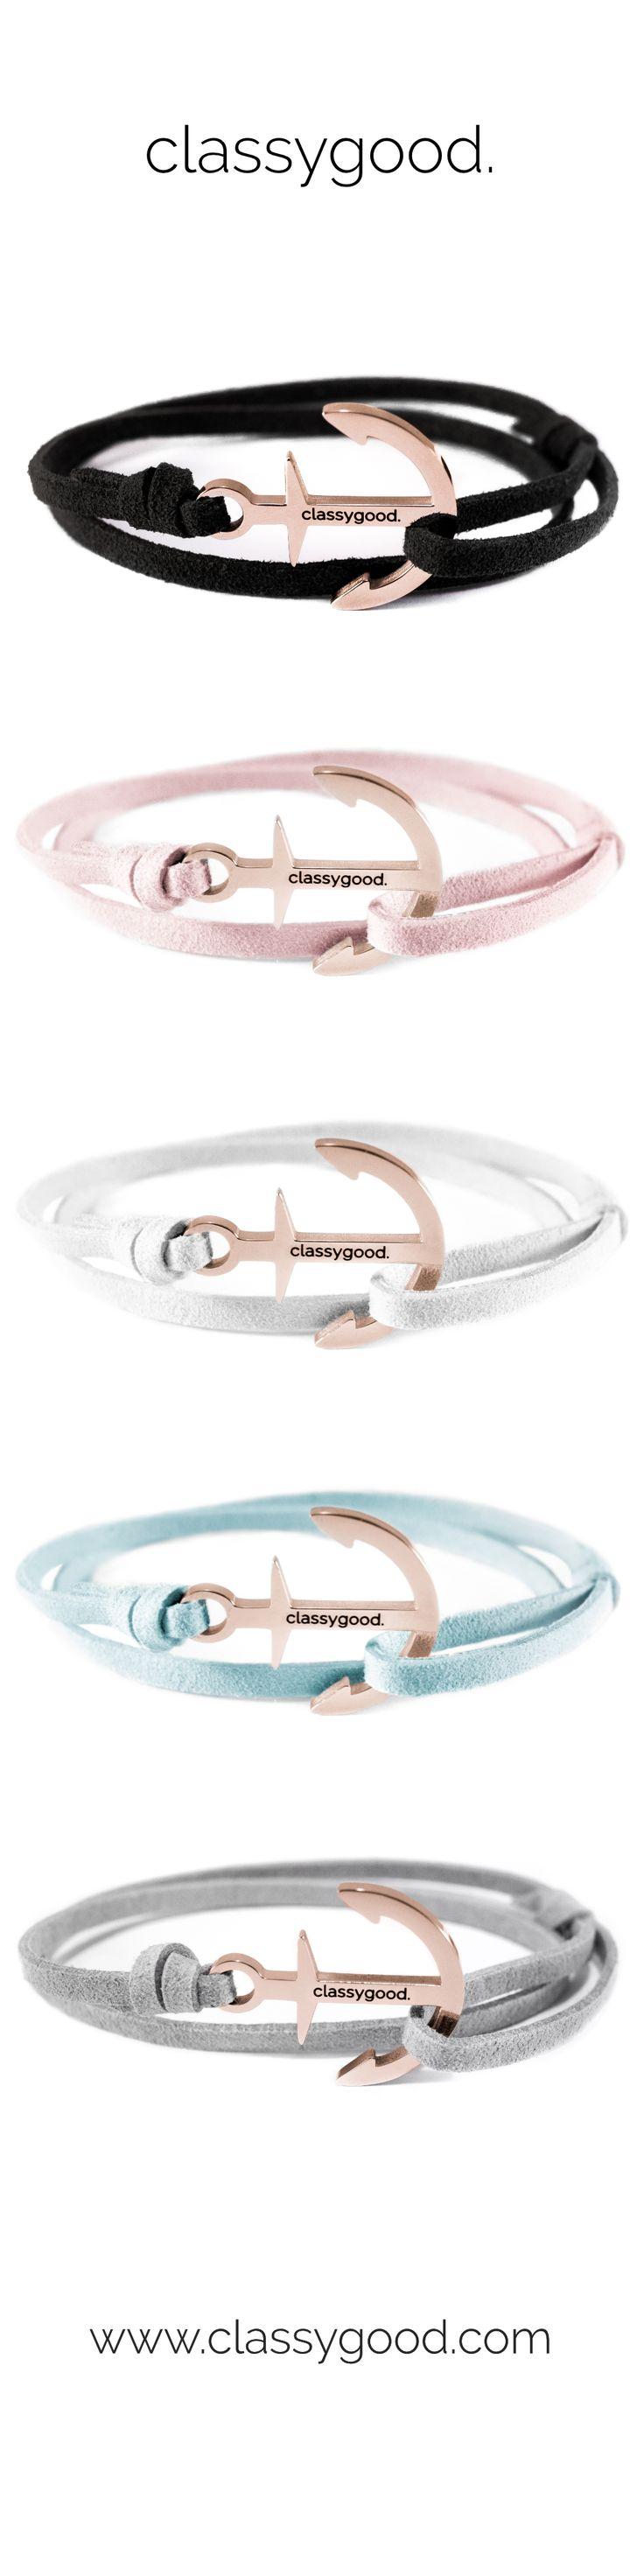 Anker Armbänder in roségold von classygood. Jetzt Entdecken! www.classygood.com